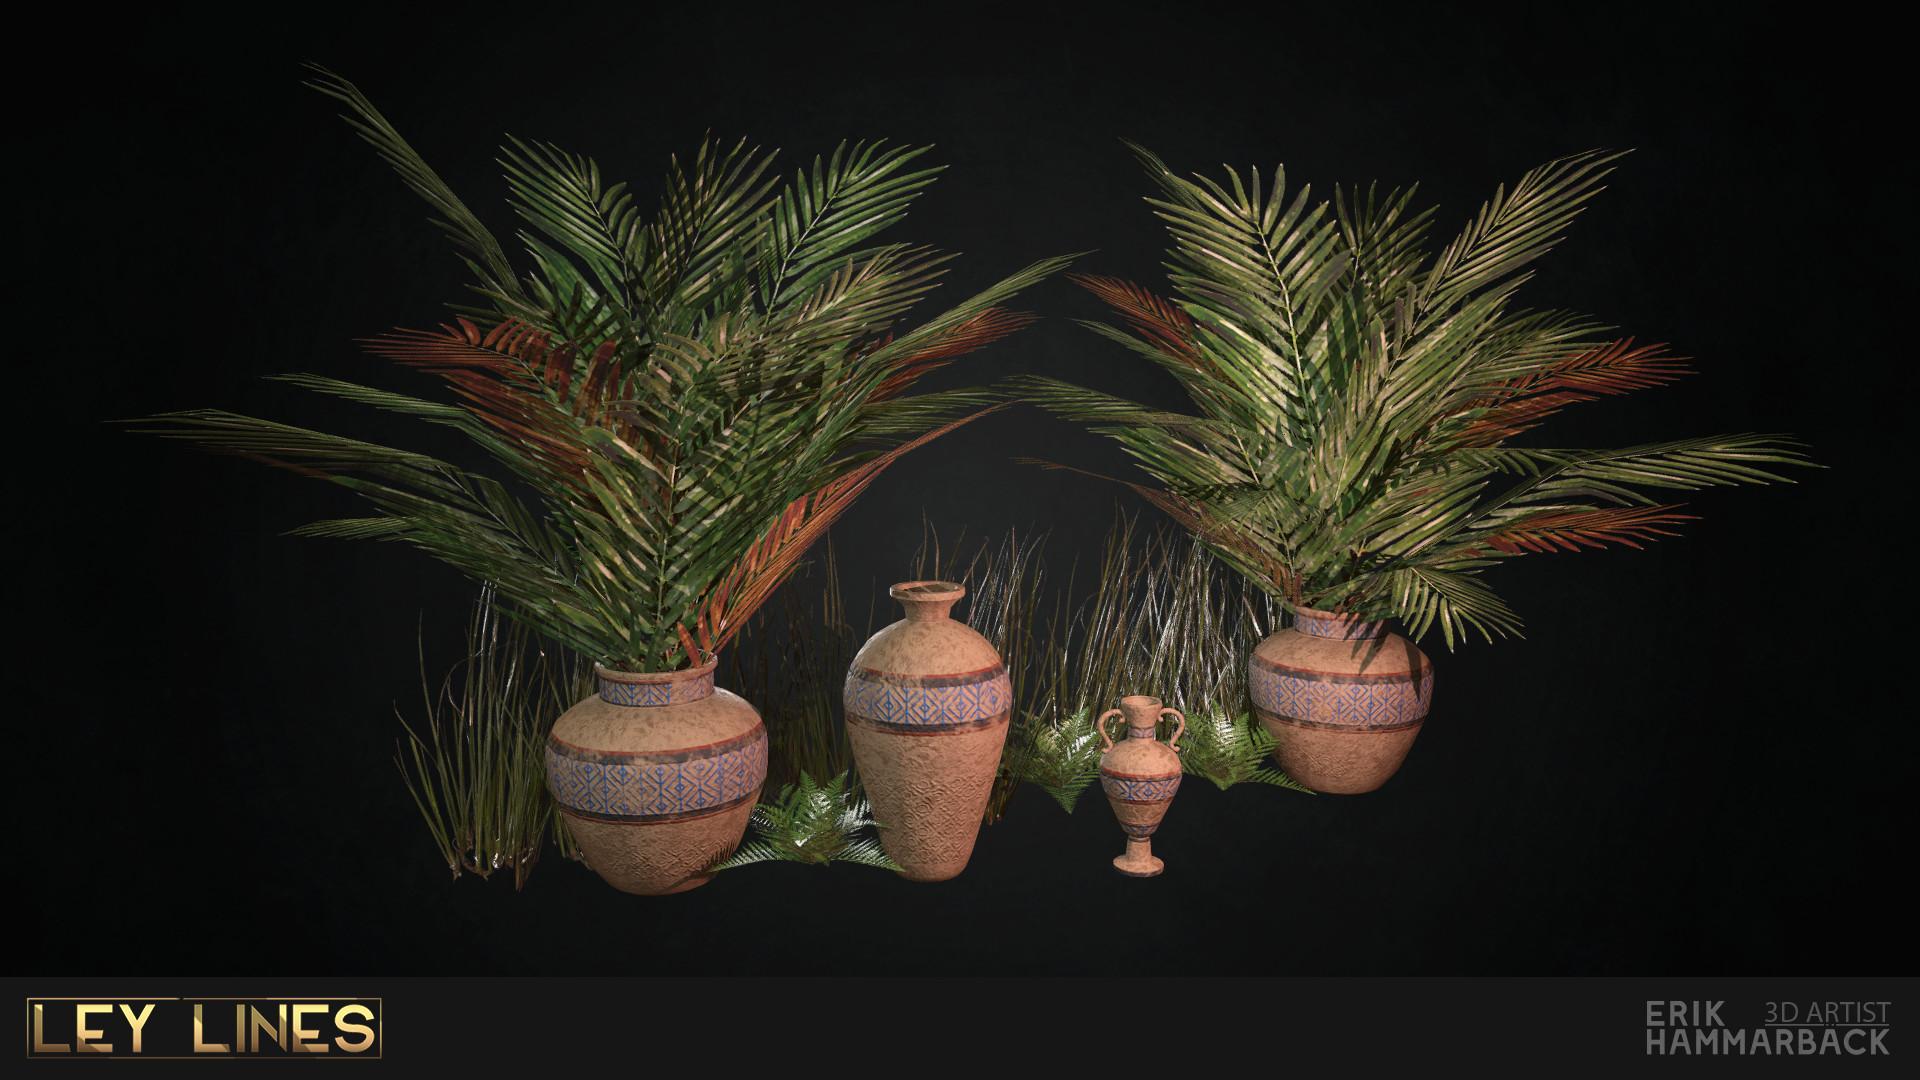 Erik hammarback leylines potsandplants erik hammarback